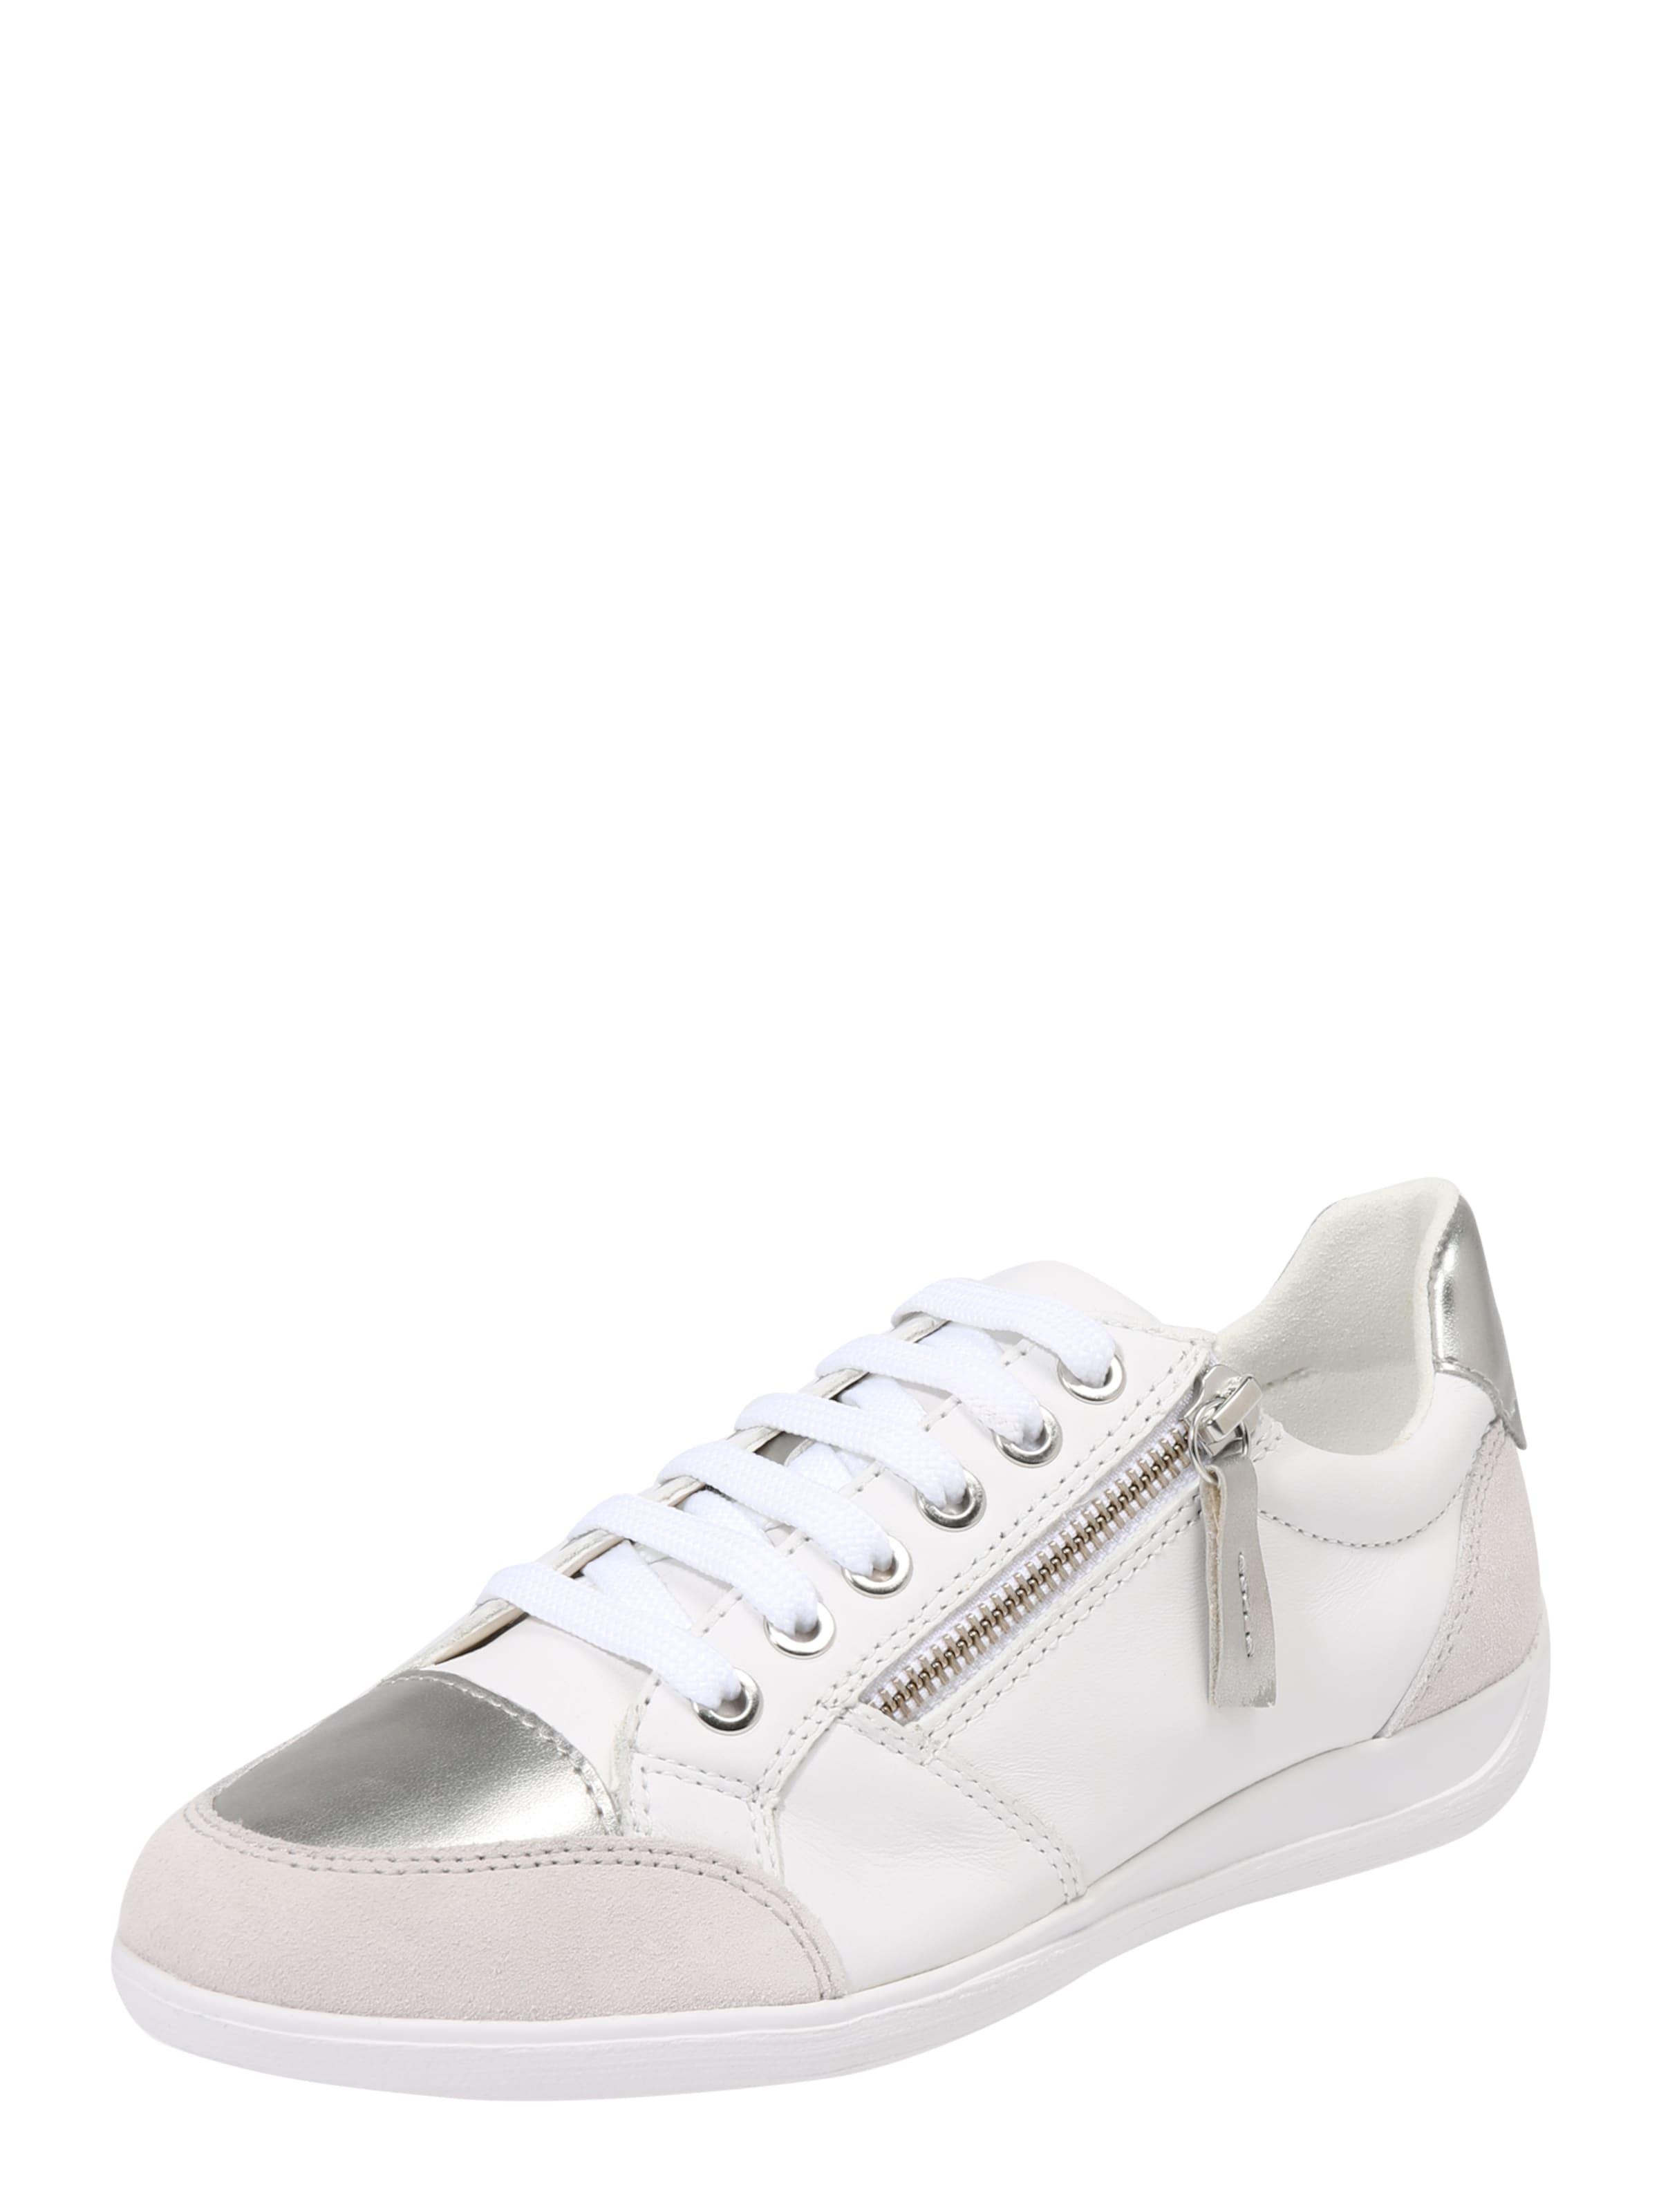 SilberWeiß Geox In 'd Sneaker Myria' rdCsQhxBt